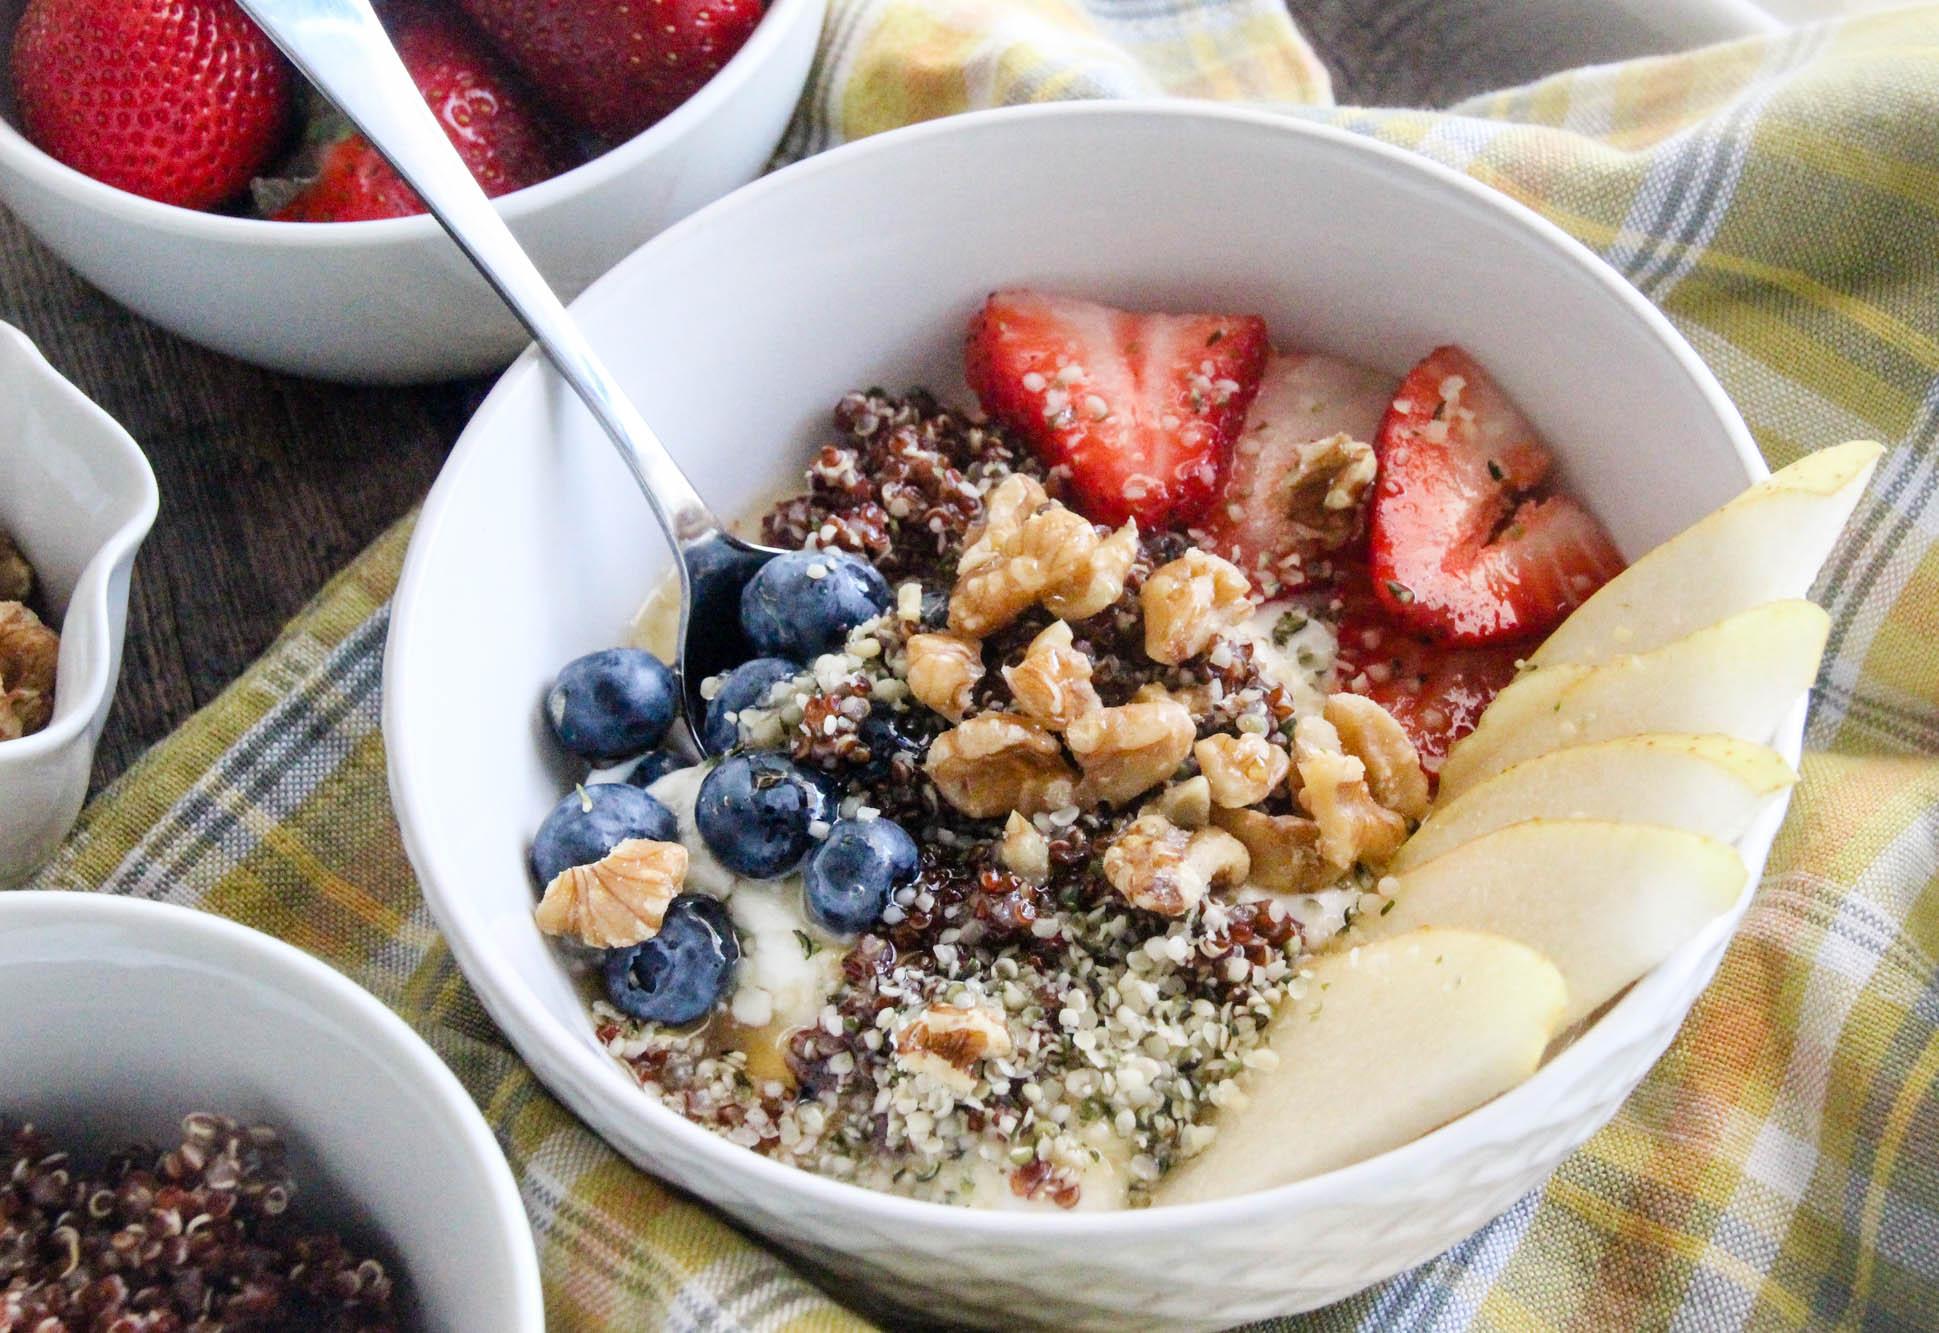 red-quinoa-hemp-hearts-fruit-smoothie-bowl-30